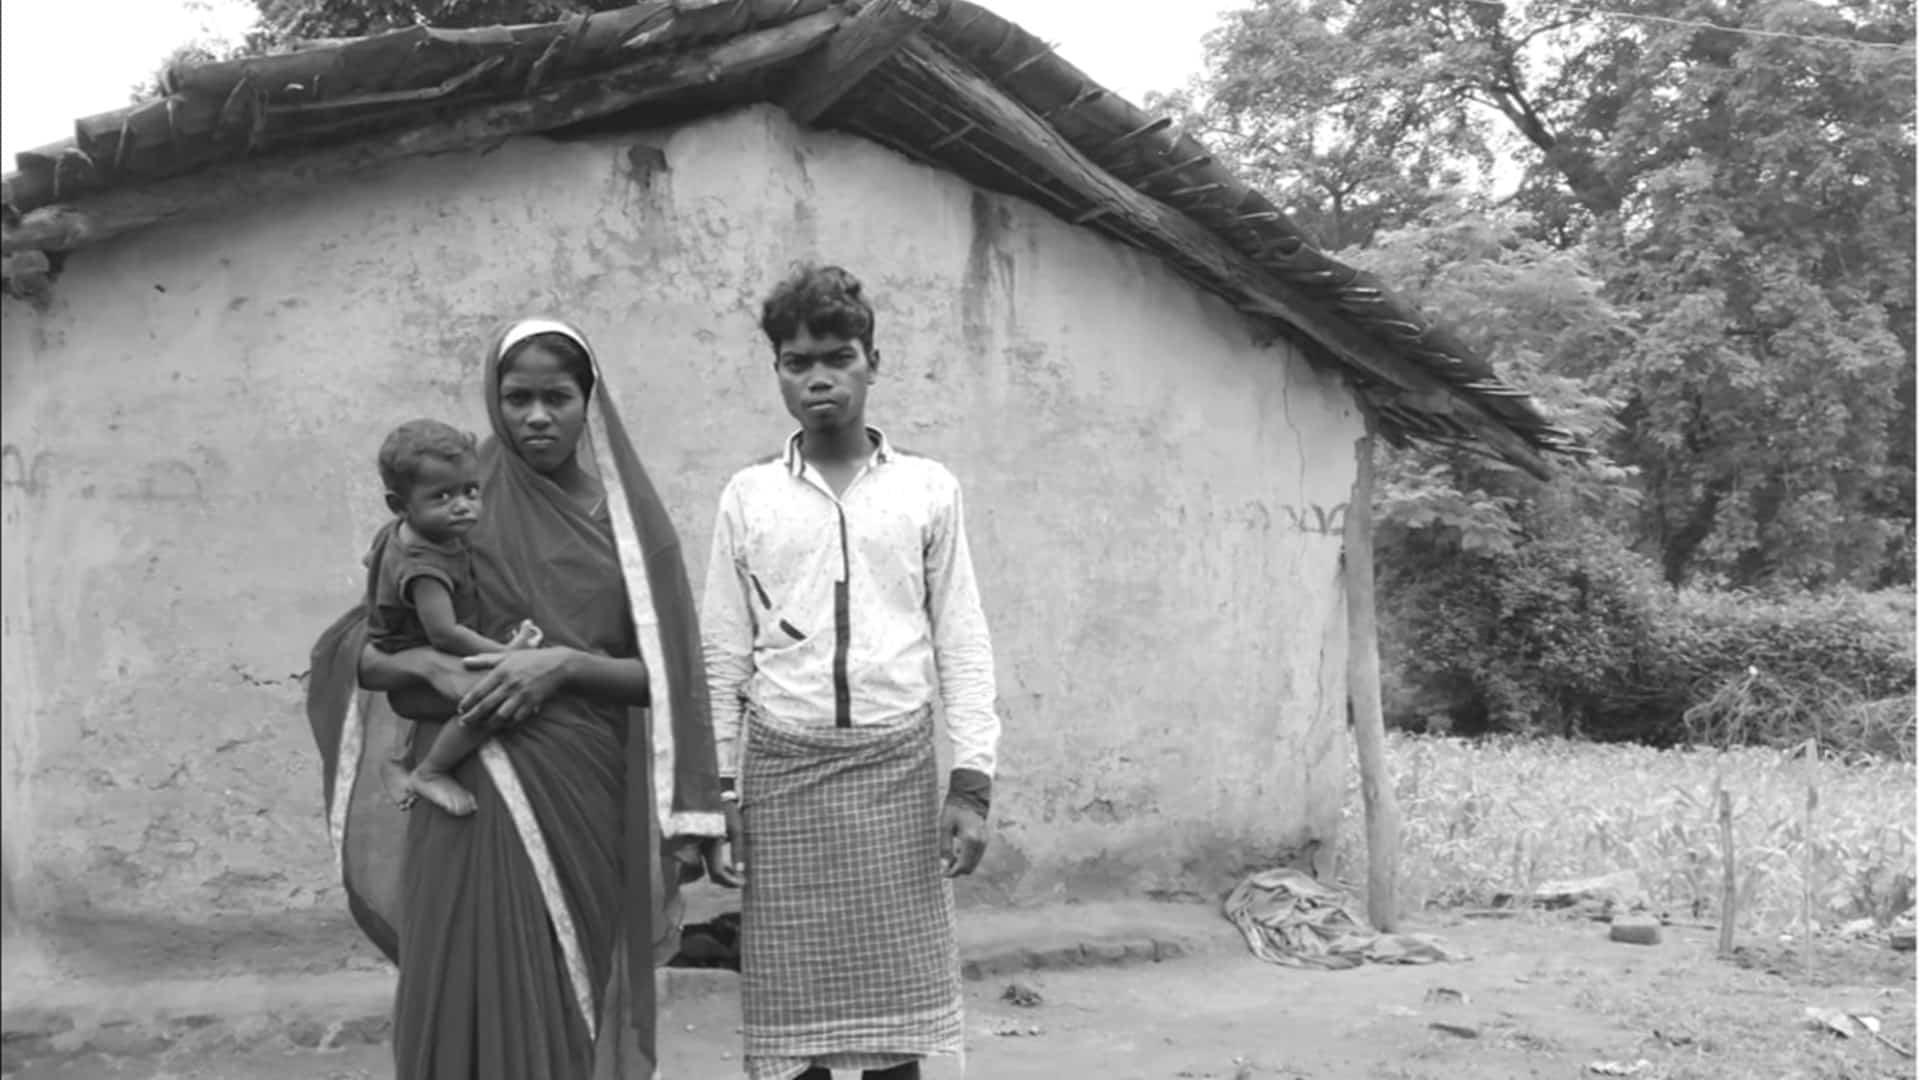 The/Nudge announces Asha Kiran to rebuild 5 Lakh rural households